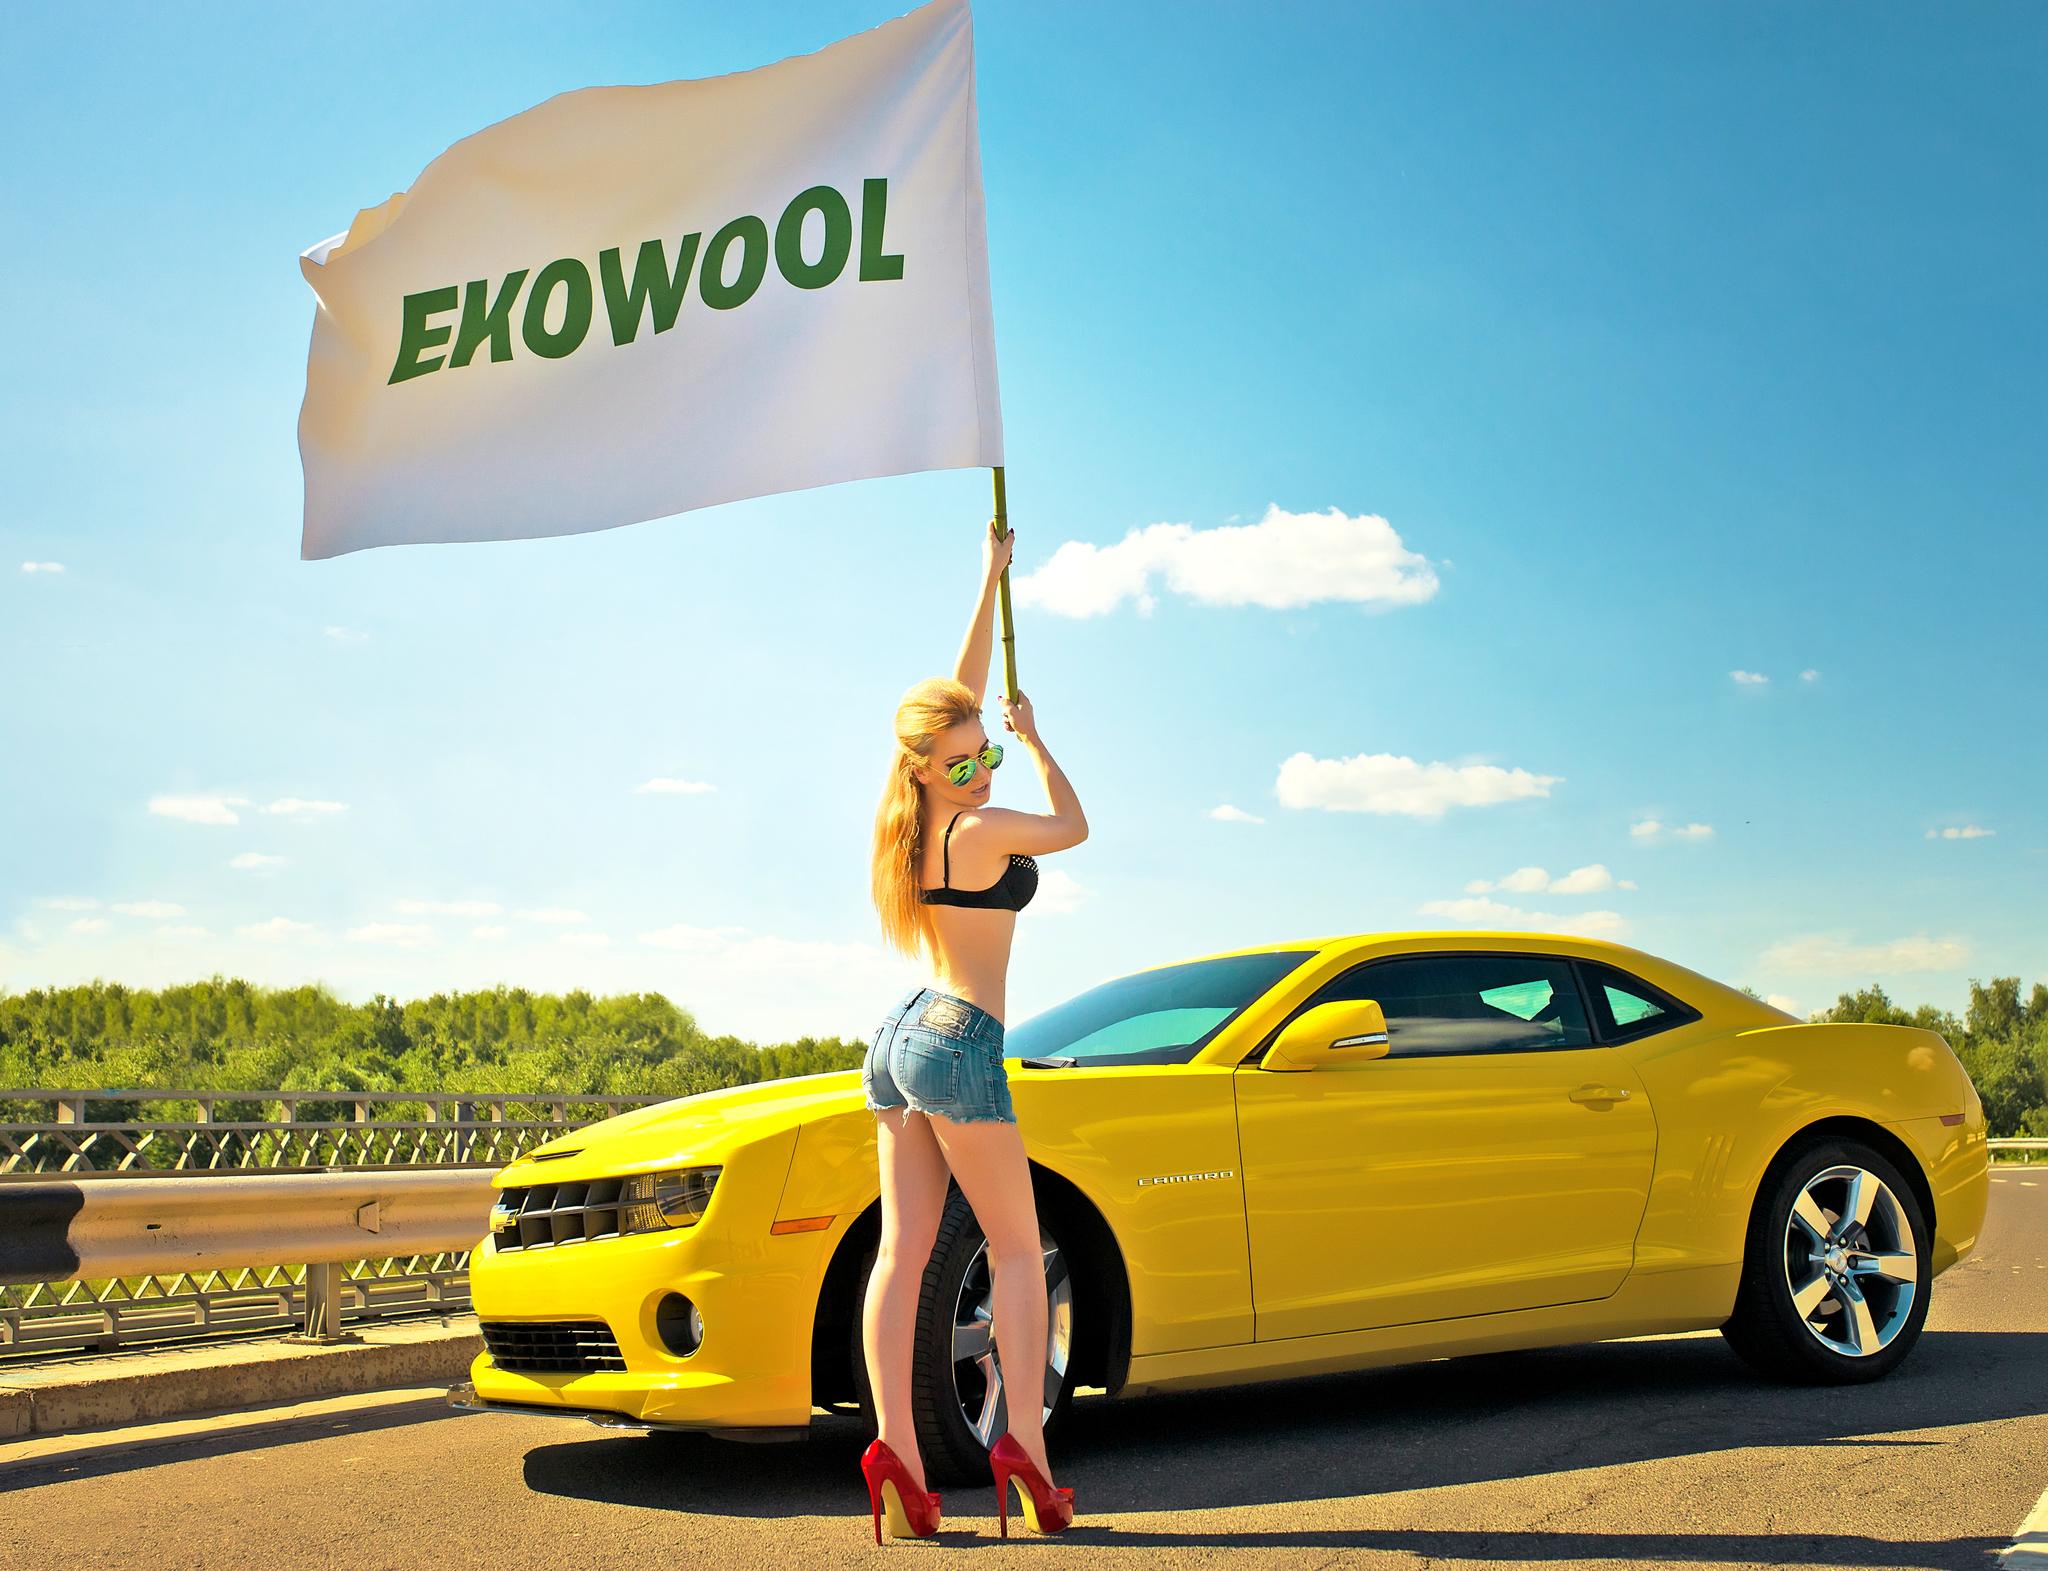 Производим кремнеземные шнуры ЭКОВУЛ (EKOWOOL)